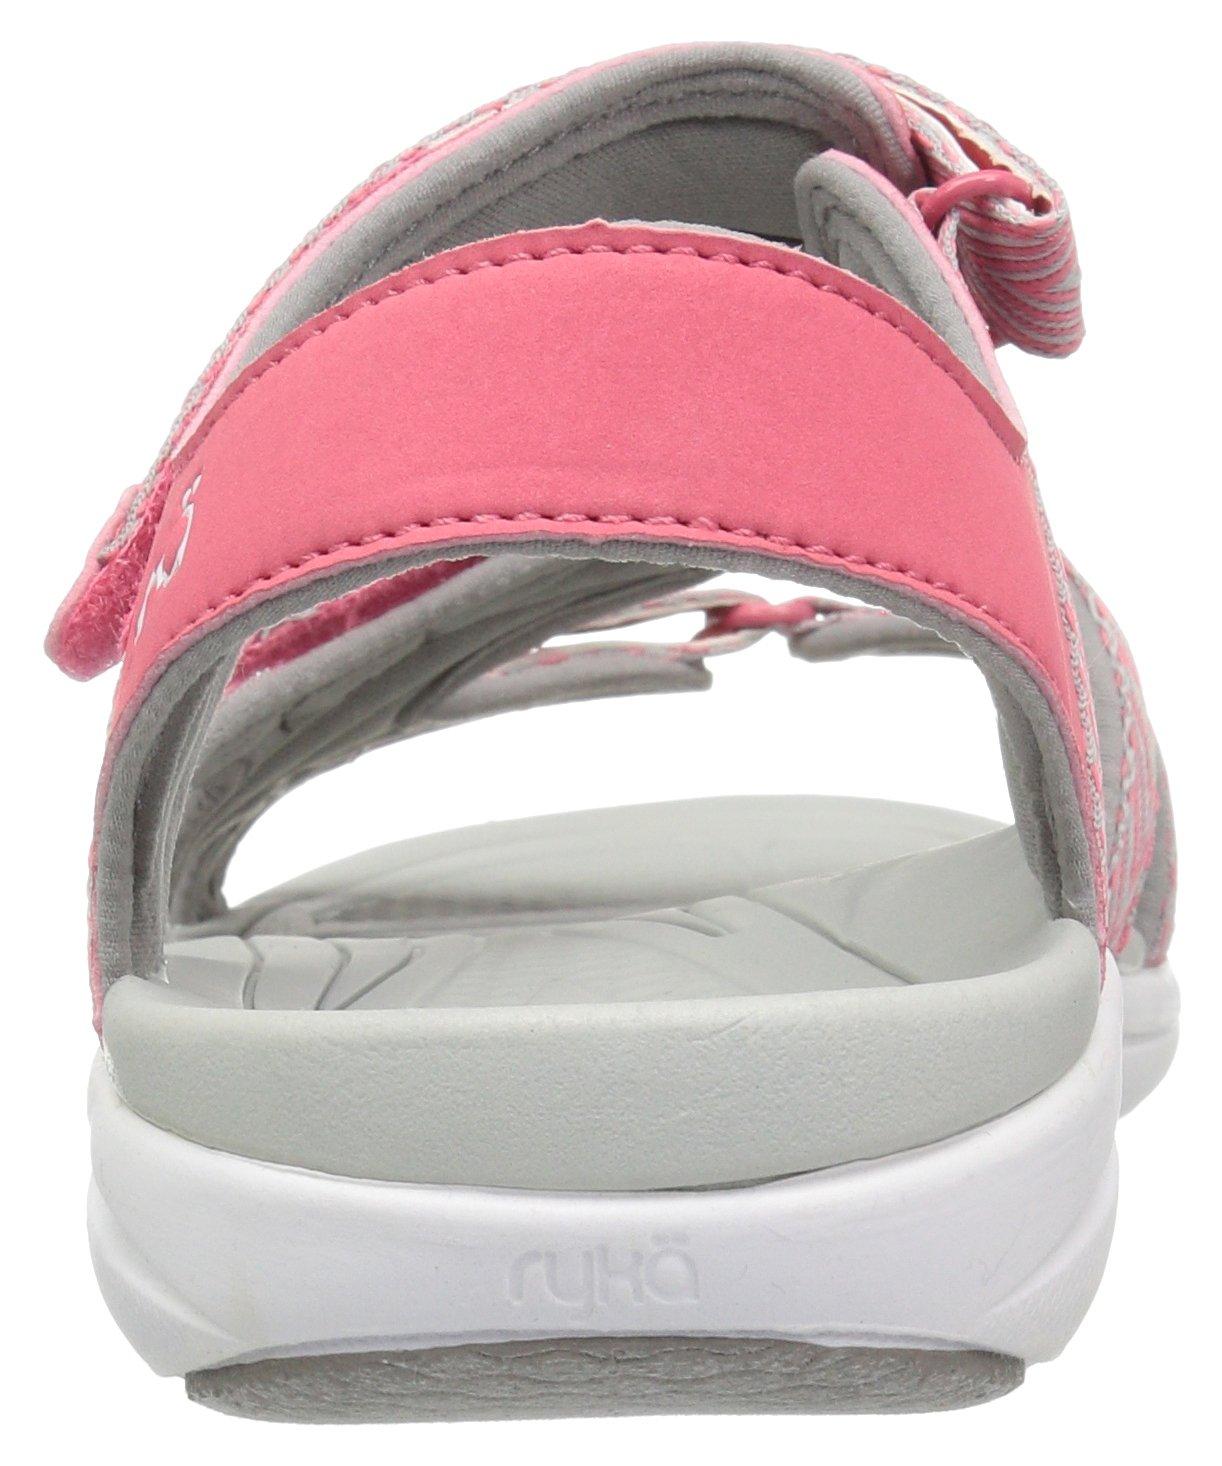 Ryka Women's Savannah Sandal B01KWH5VPY 10 W US|Coral/Grey